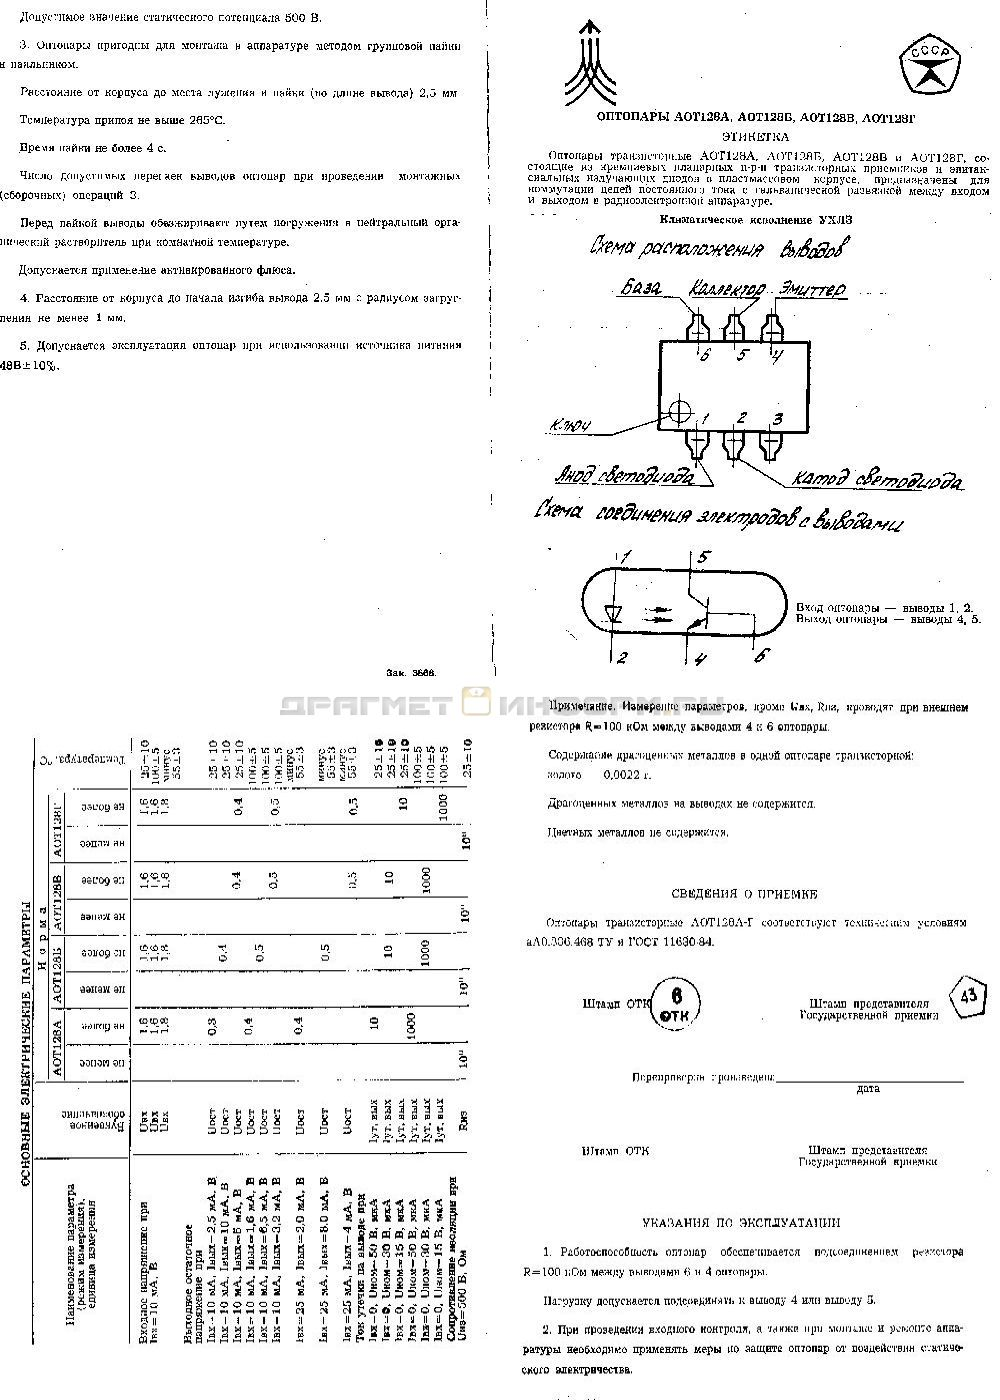 Формуляр АОТ128А